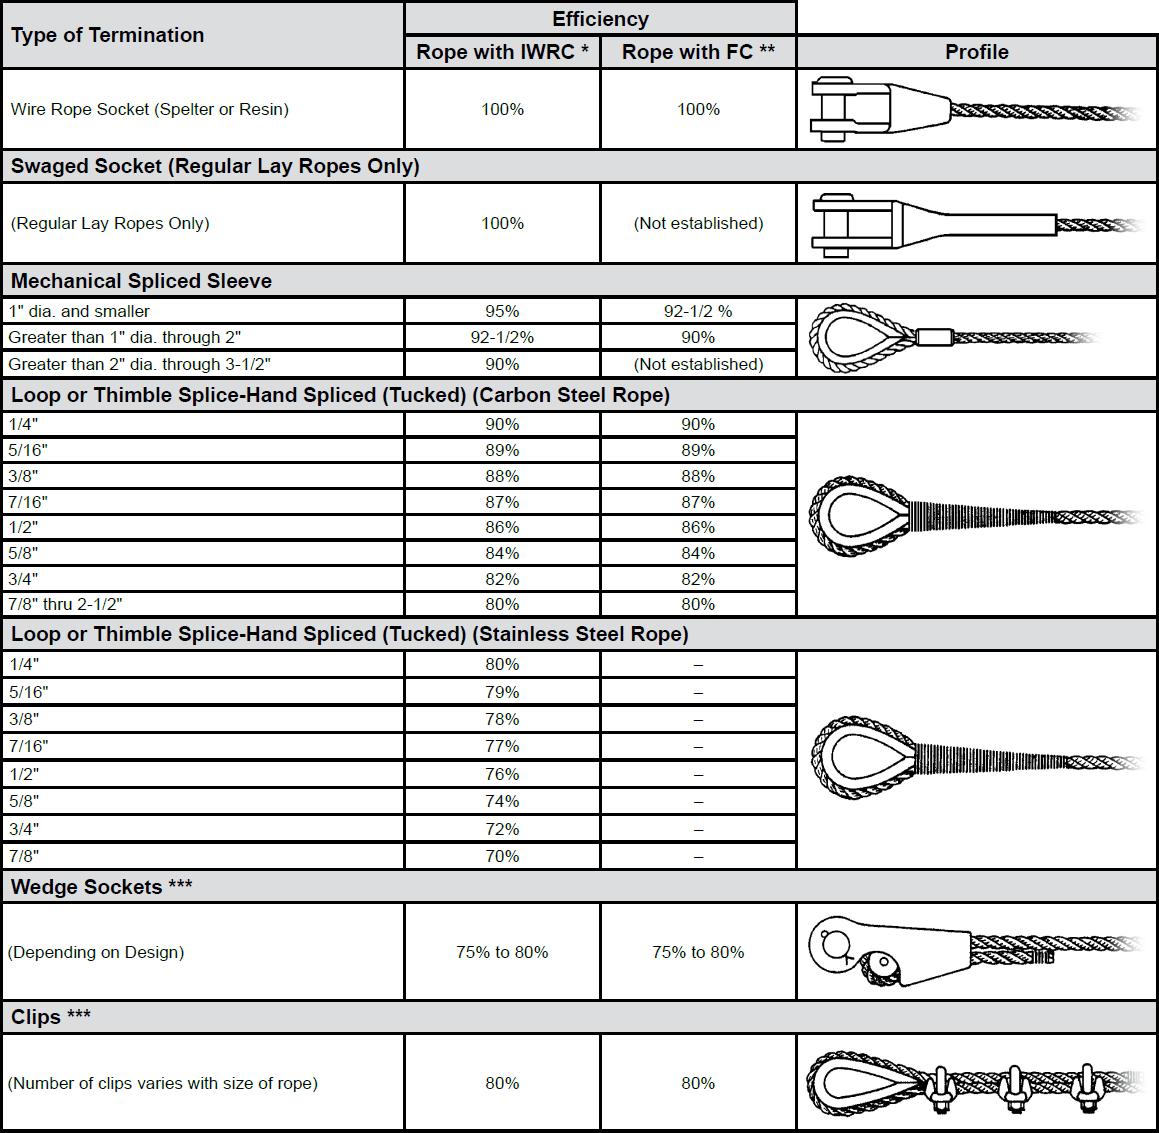 Terminal Efficiencies (Approximate) chart